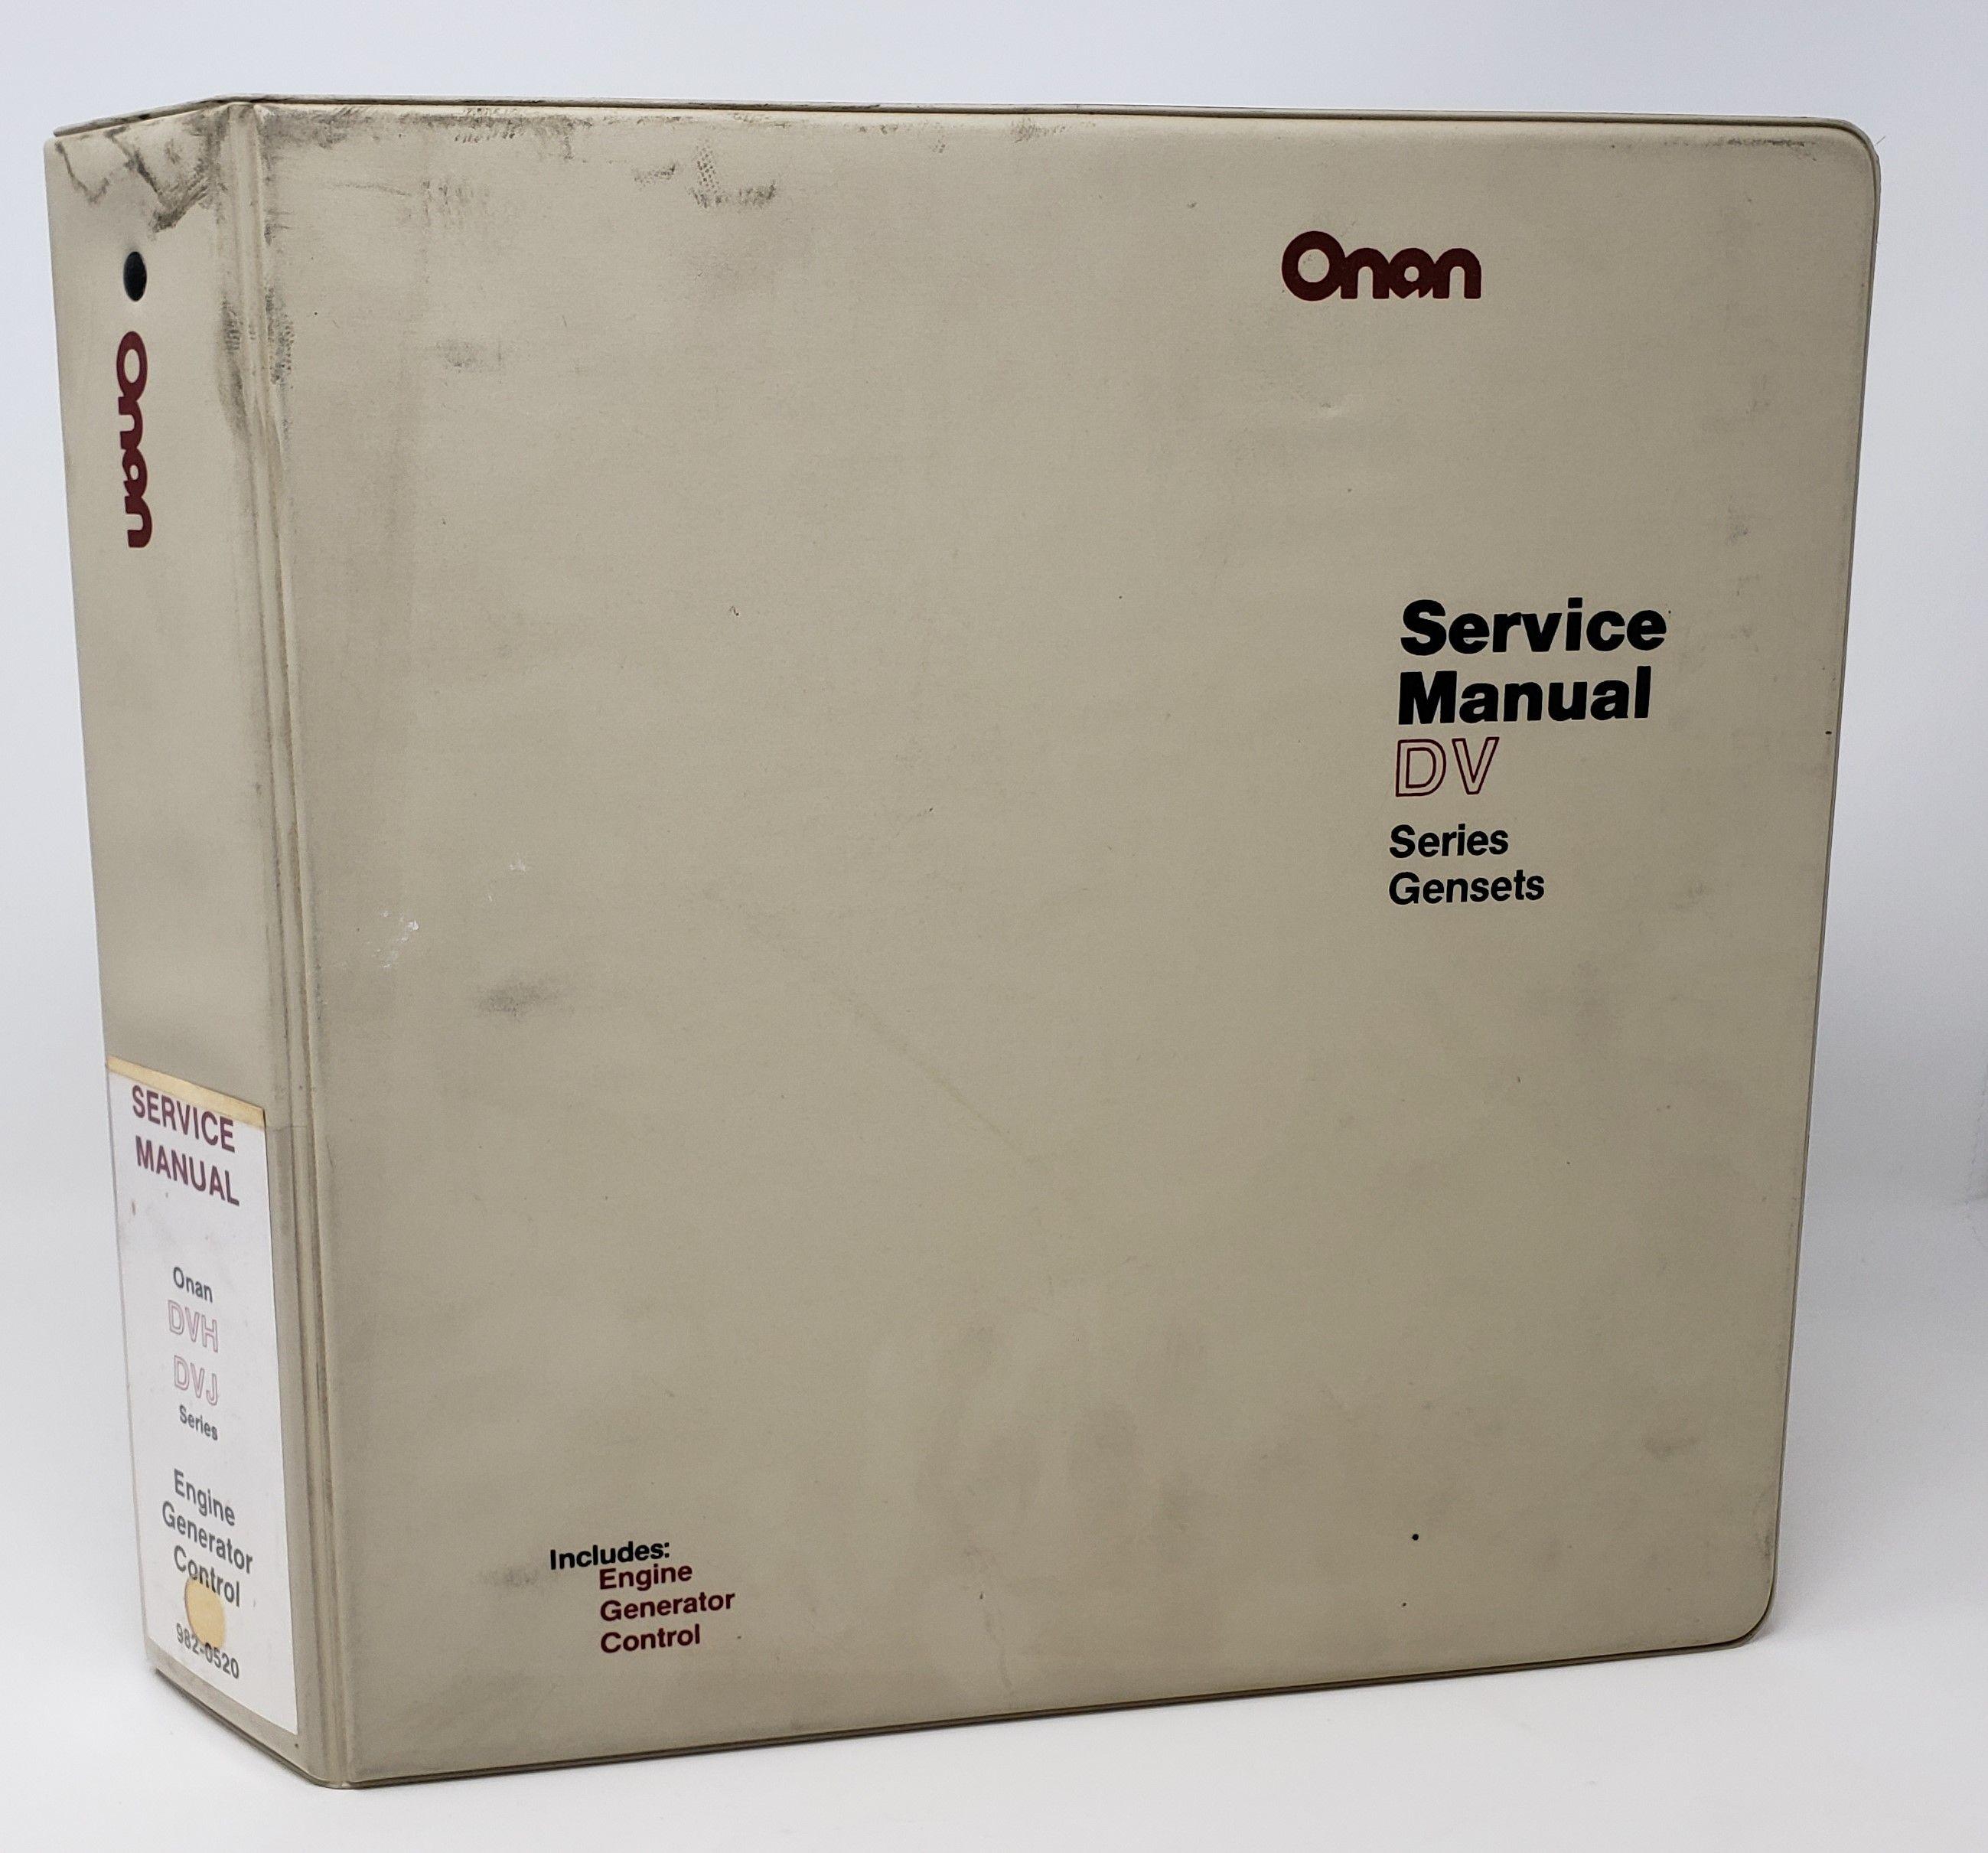 Onan Dvh Dvj Series Engine Generator Control Service Manual Set 982 0520 Onan Welder Generator Manual